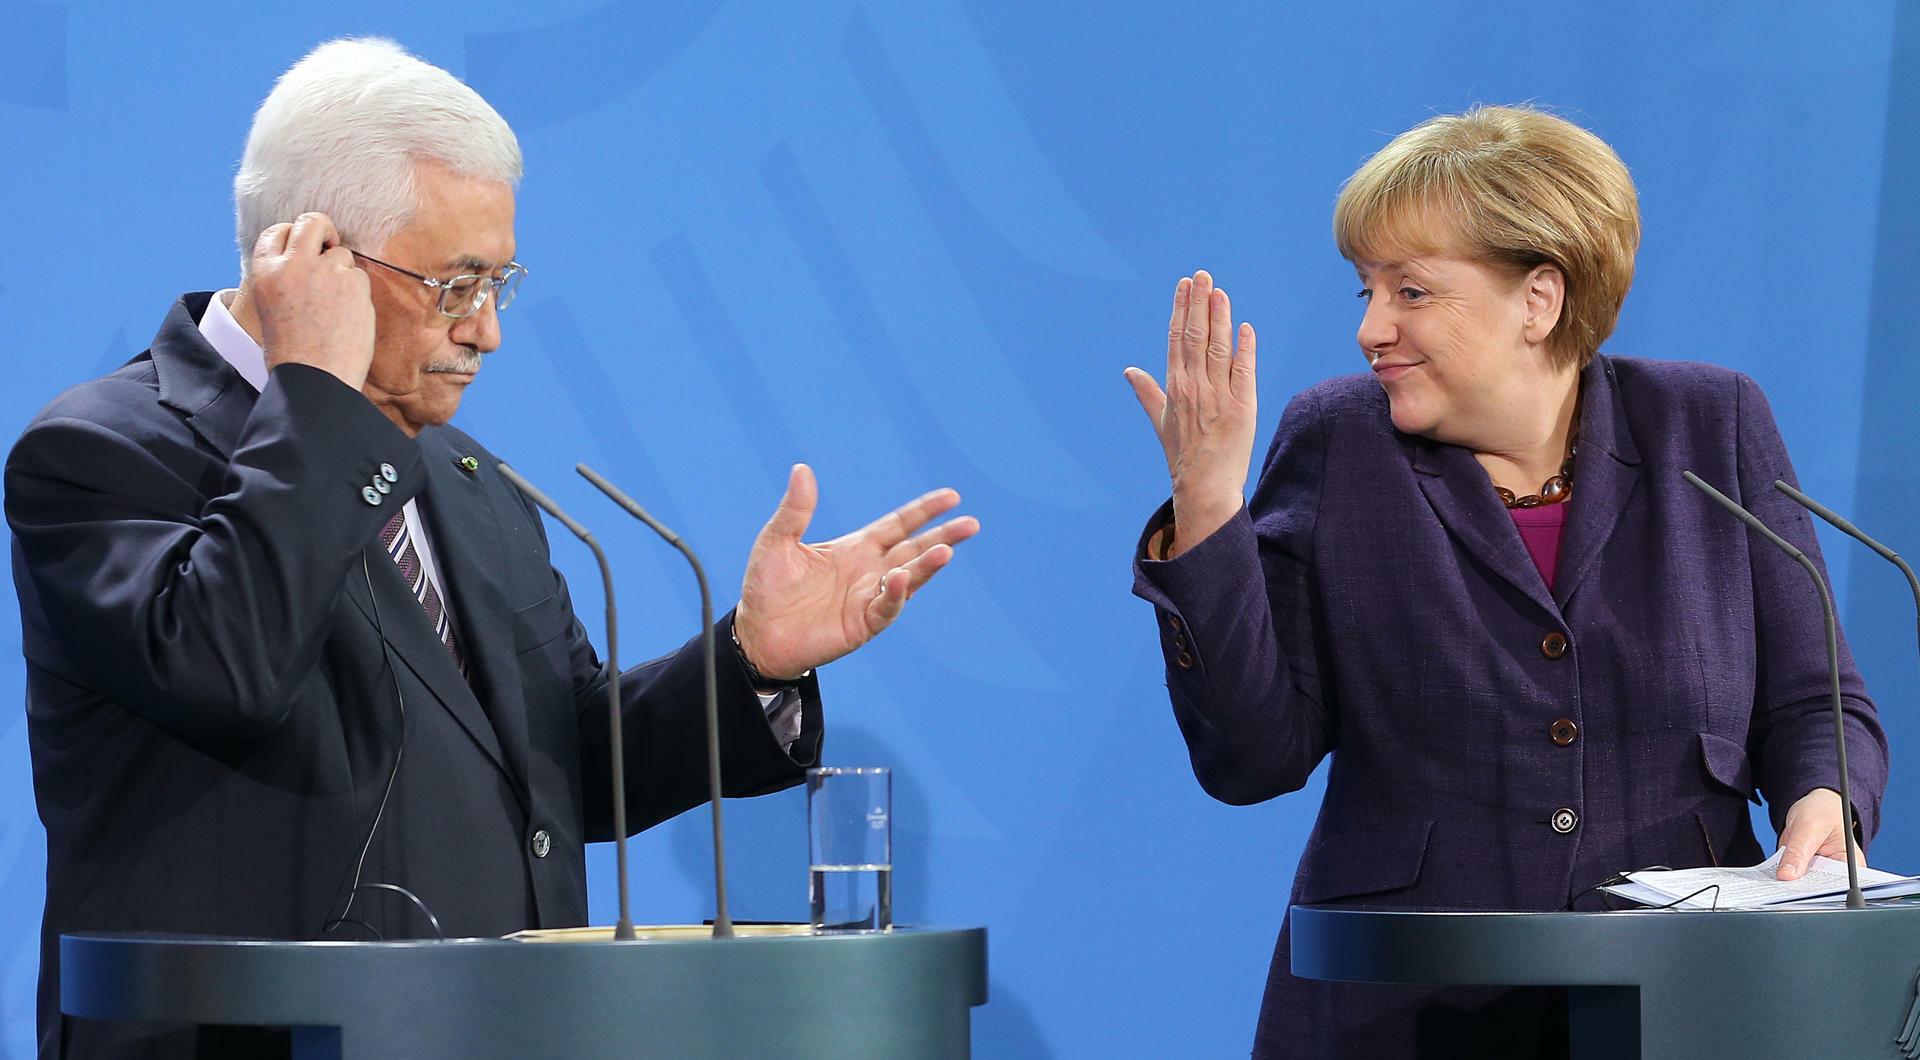 Nahost Friedensprozess Abbas Sucht Hilfe Bei Merkel